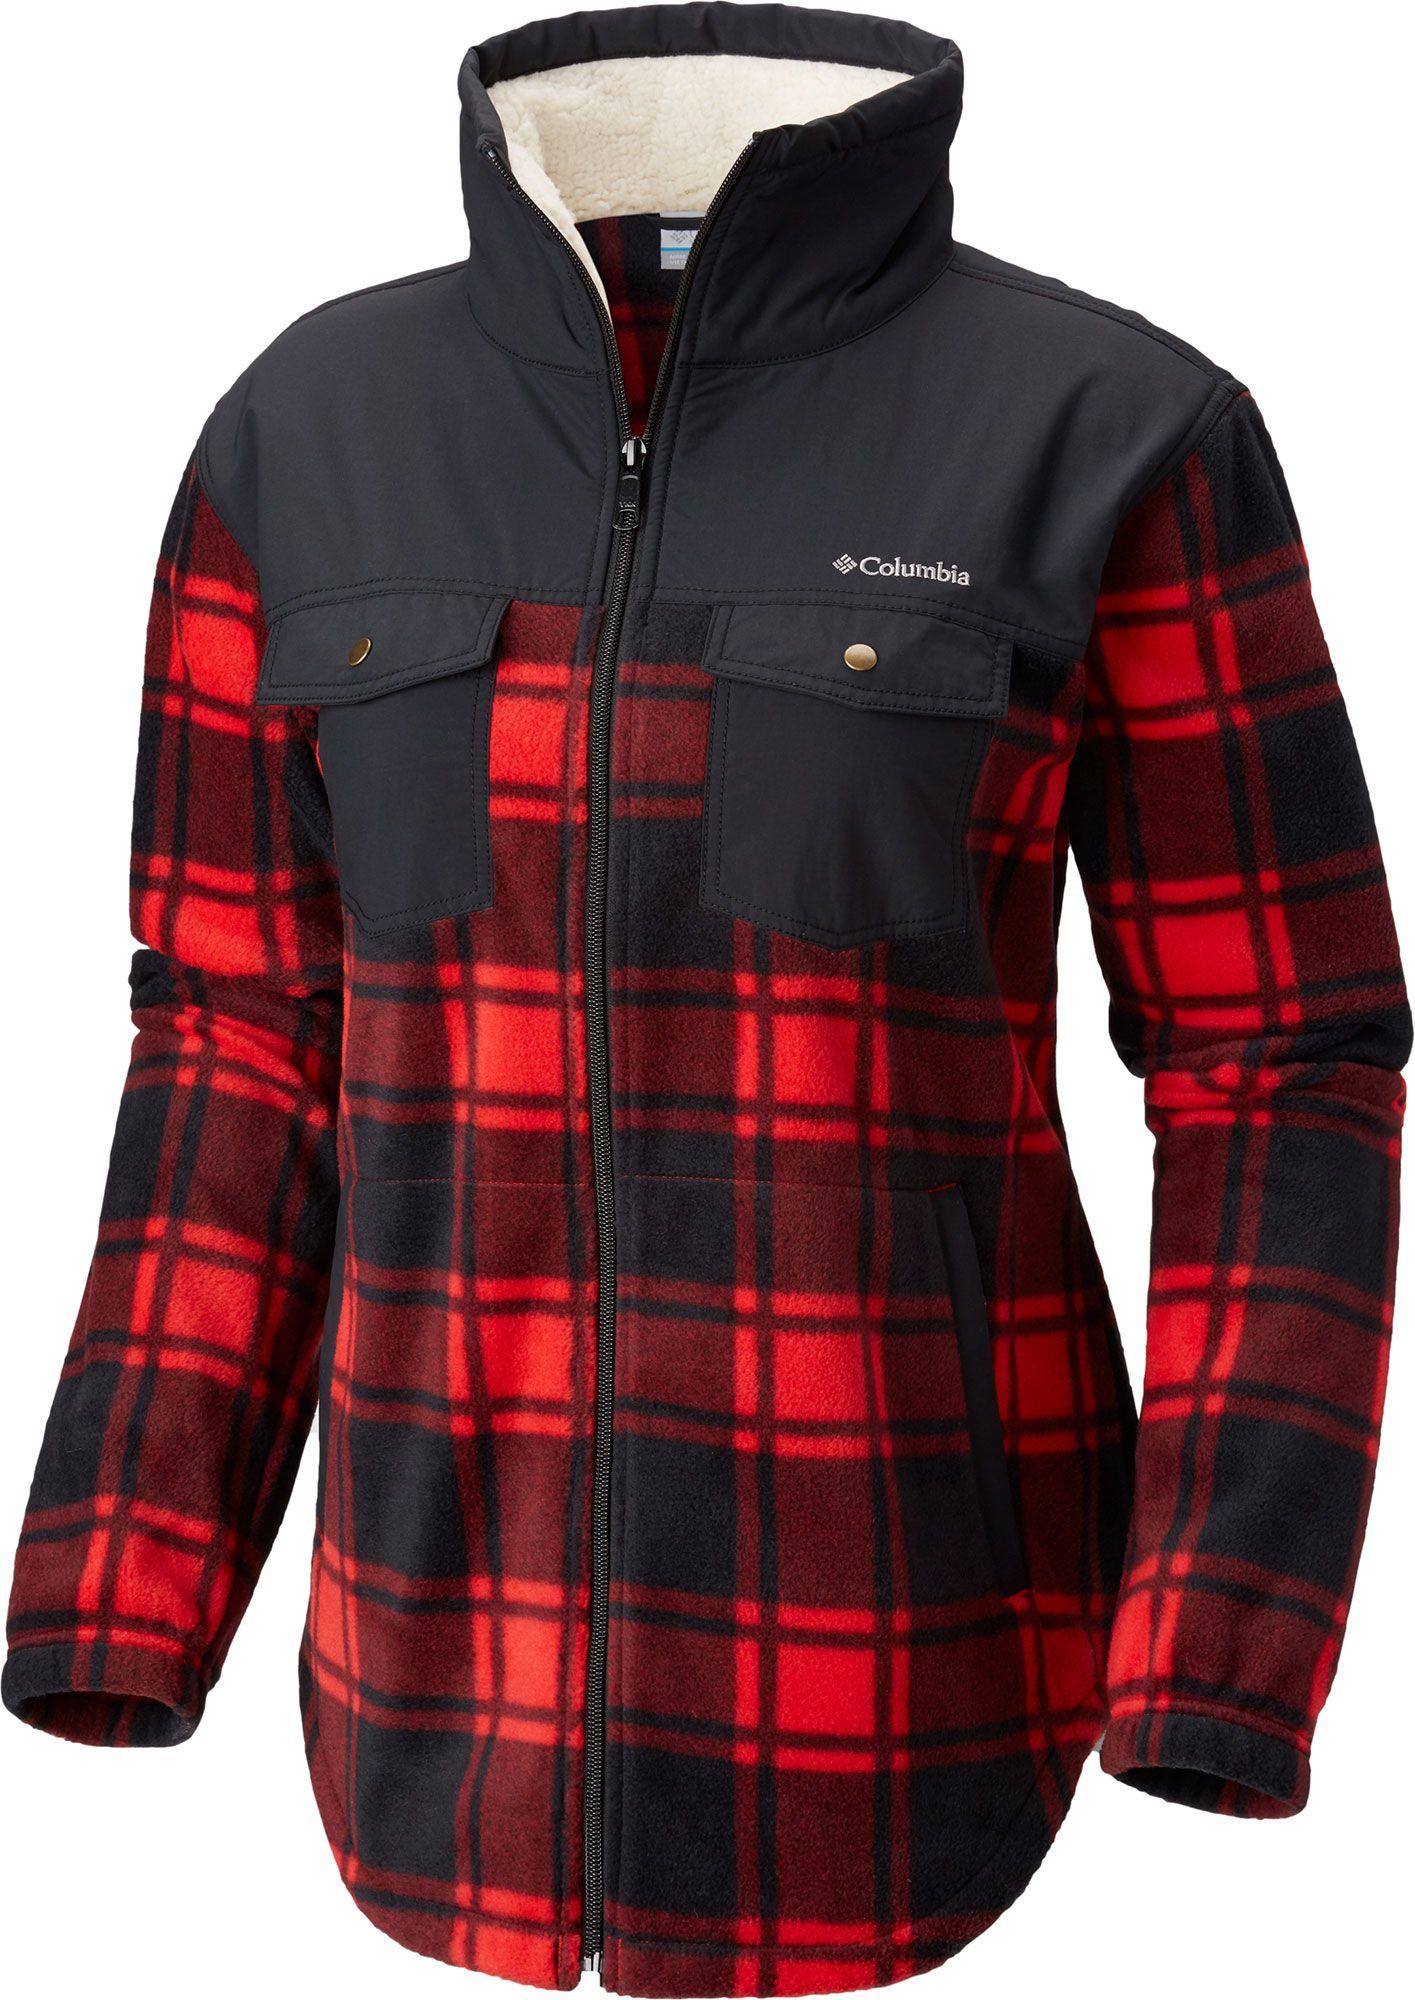 c6348e59a Columbia Women's Benton Springs Overlay Fleece Jacket | Products ...